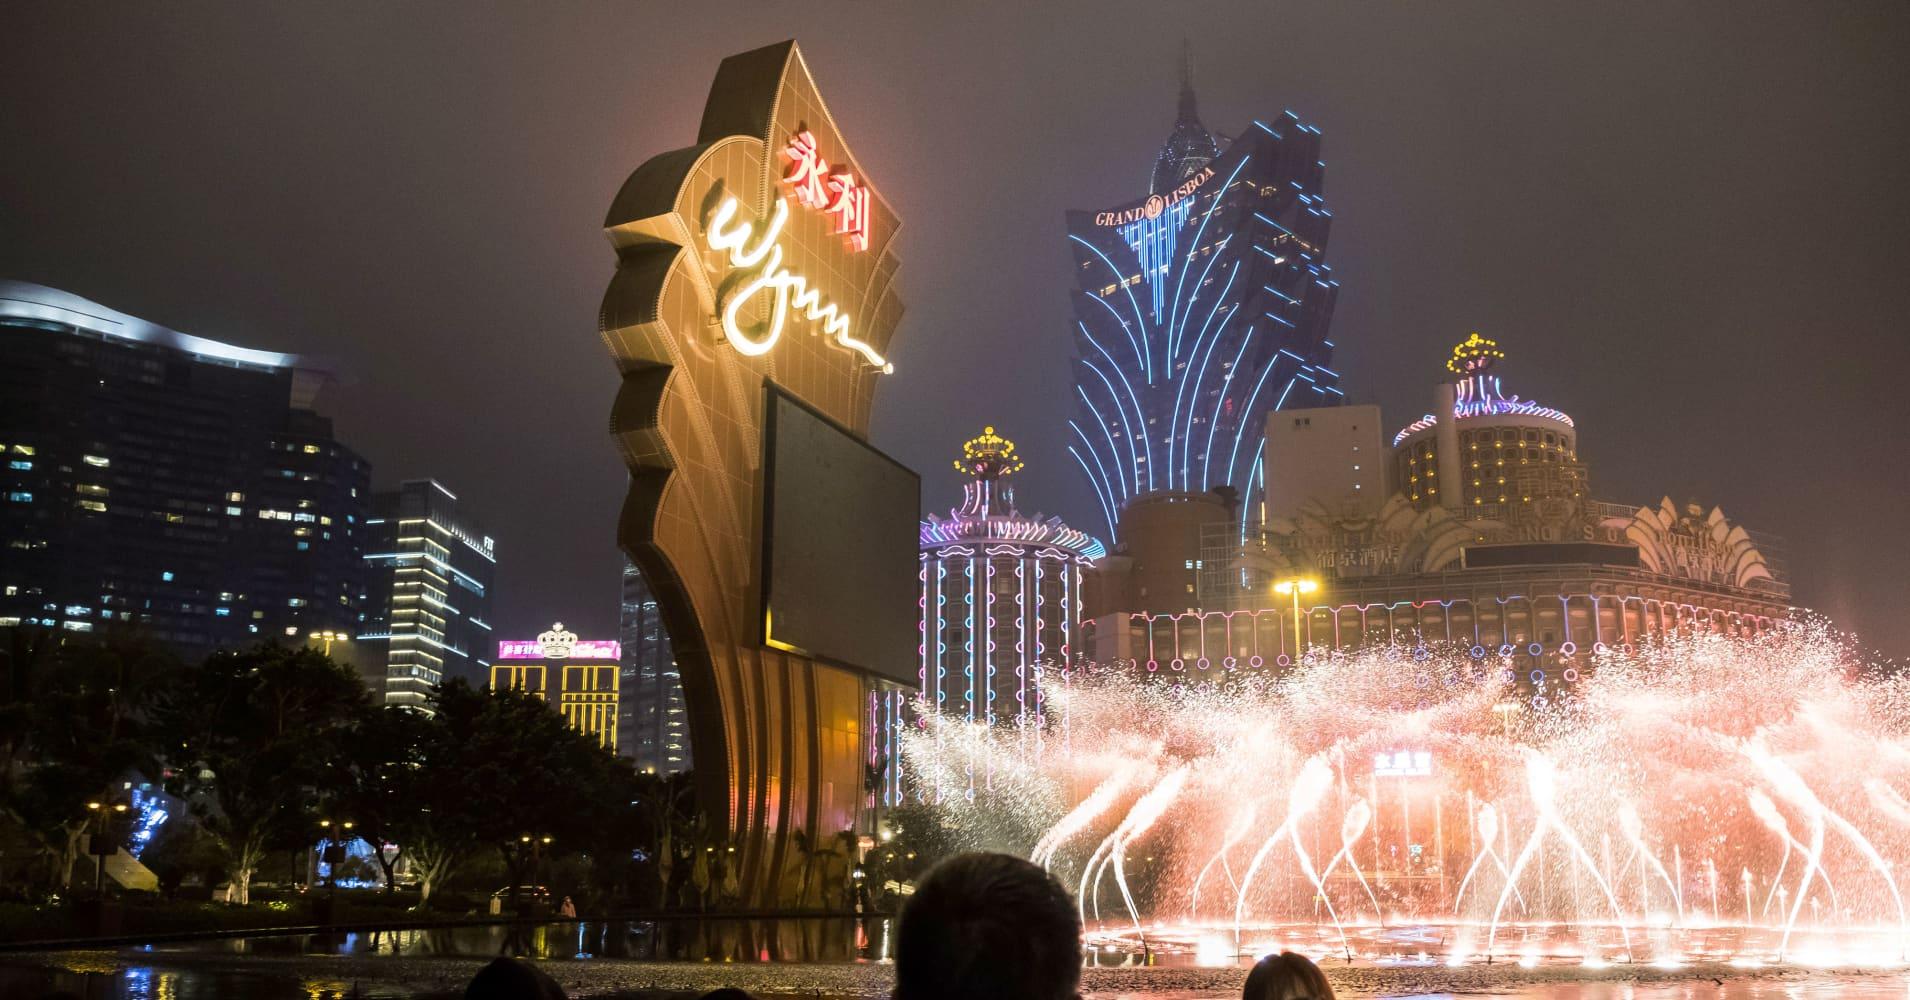 Wynn Resorts shares fall 12 percent as it misses earnings estimates